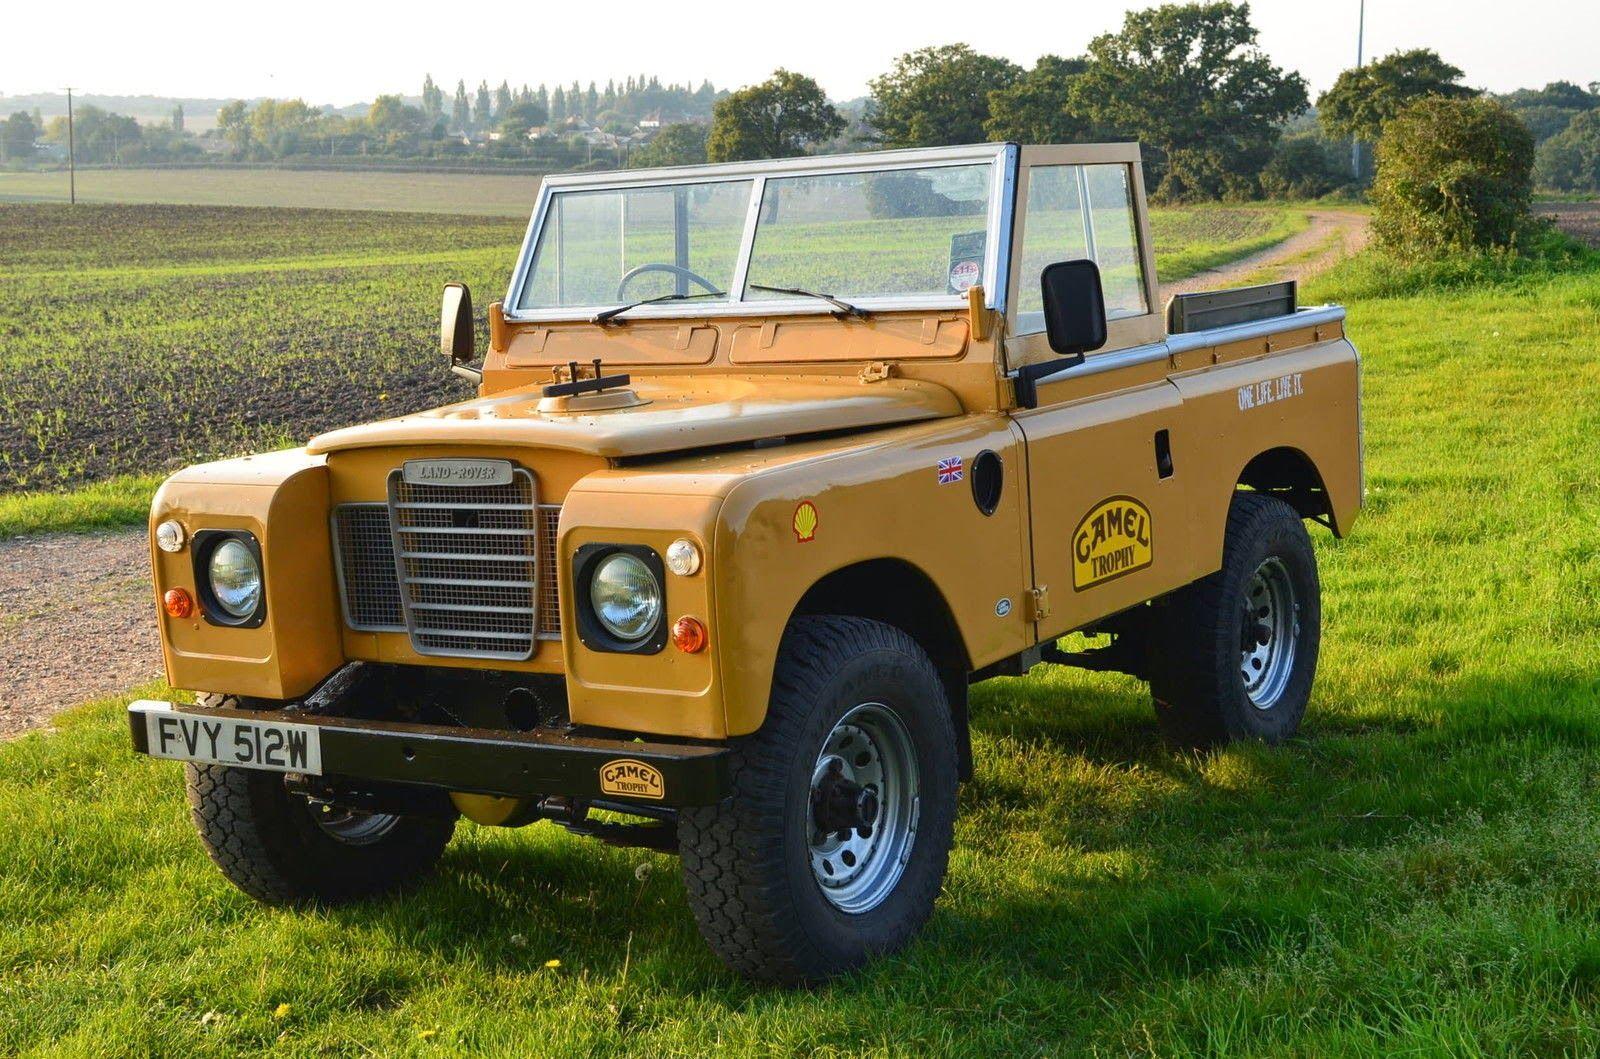 1981 Land Rover Series Iii Camel Trophy Jpg 1600 215 1059